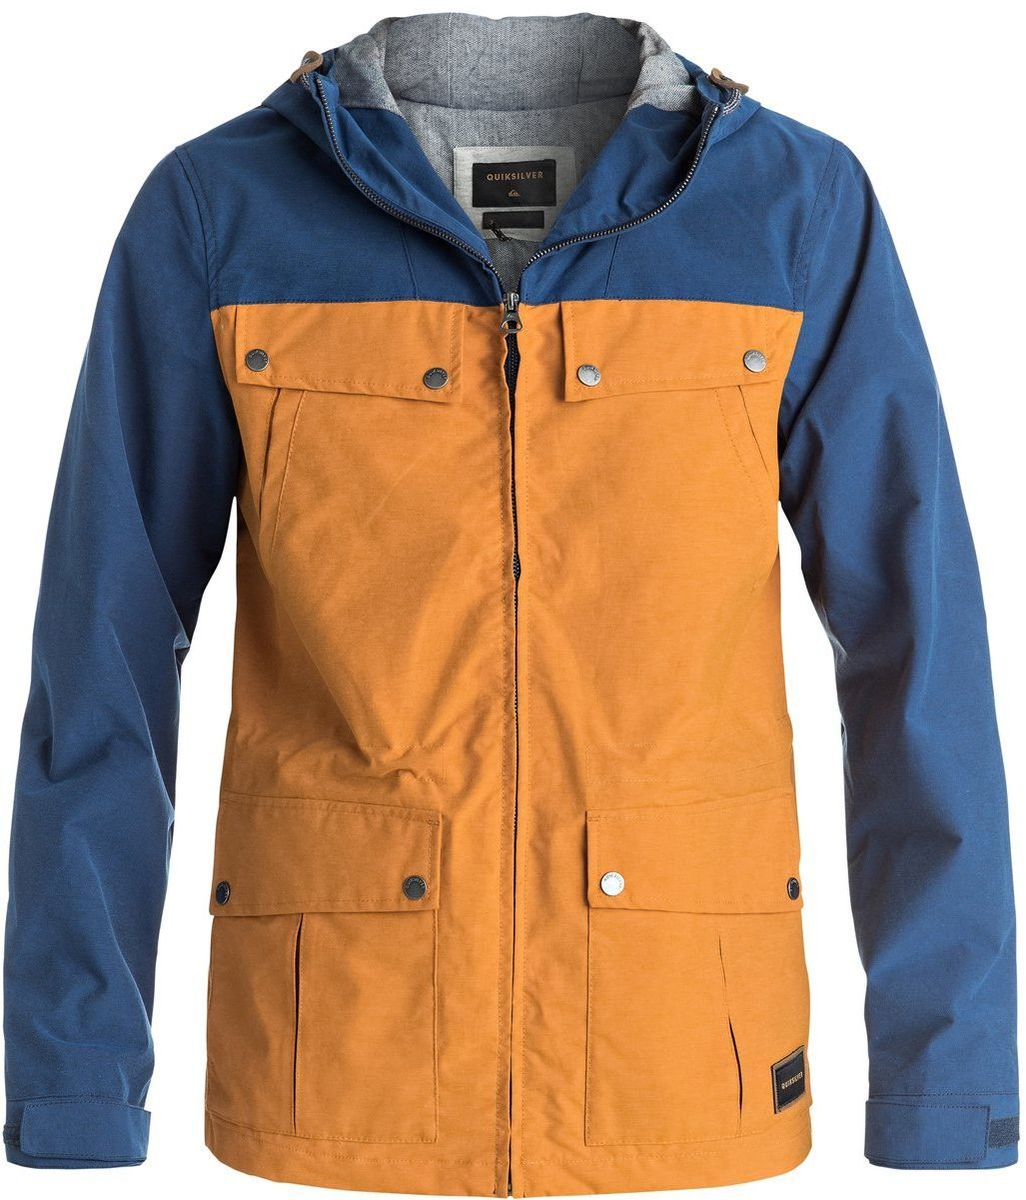 Куртка мужская Quiksilver, цвет: желтый, синий. EQYJK03292-NMVH. Размер M (48/50) quiksilver куртка утепленная мужская quiksilver mission